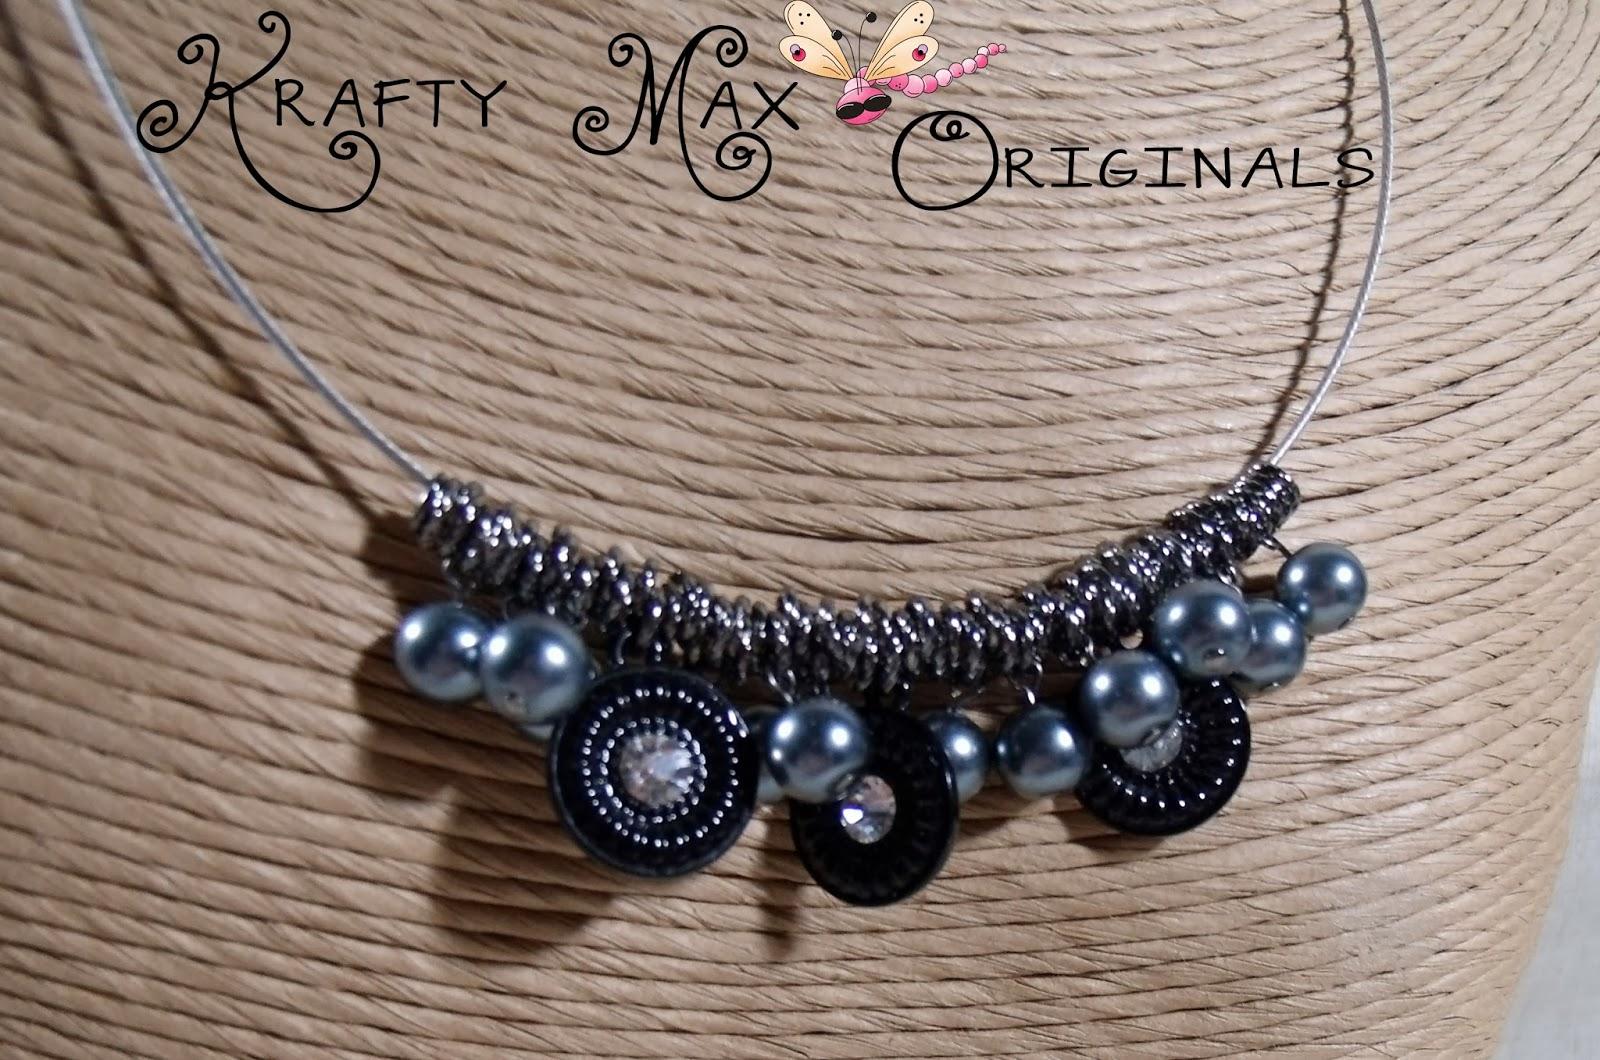 http://www.artfire.com/ext/shop/product_view/KraftyMax/8255624/black_and_grey_prima_beads_blog_team_necklace_-_a_krafty_max_original_/handmade/jewelry/necklaces/glass